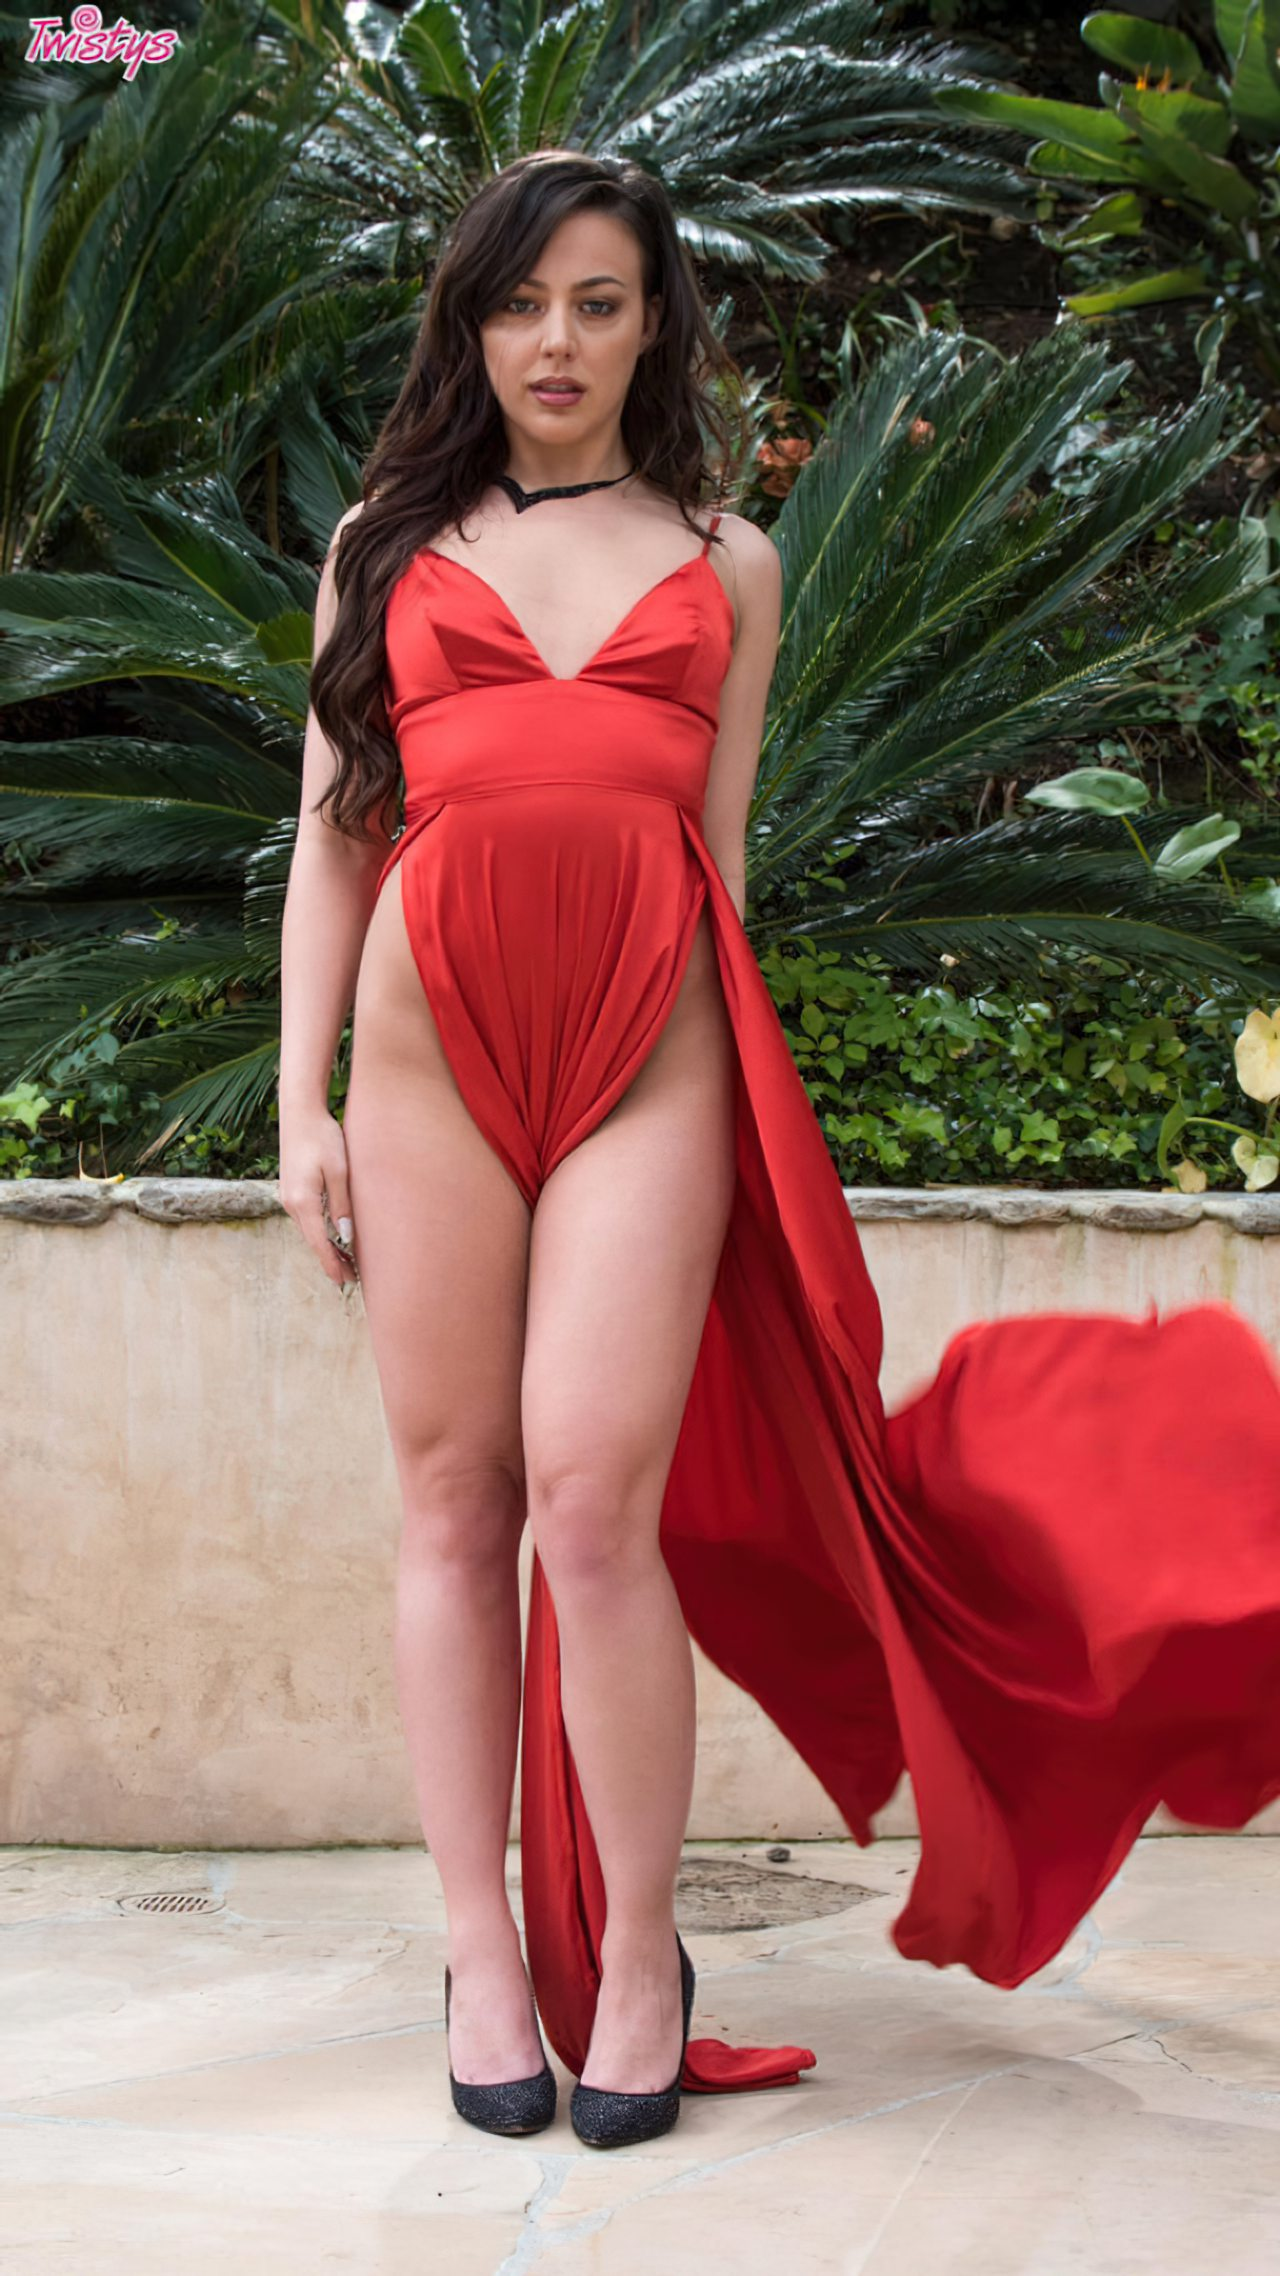 Despindo Vestido Vermelho Jardim (3)